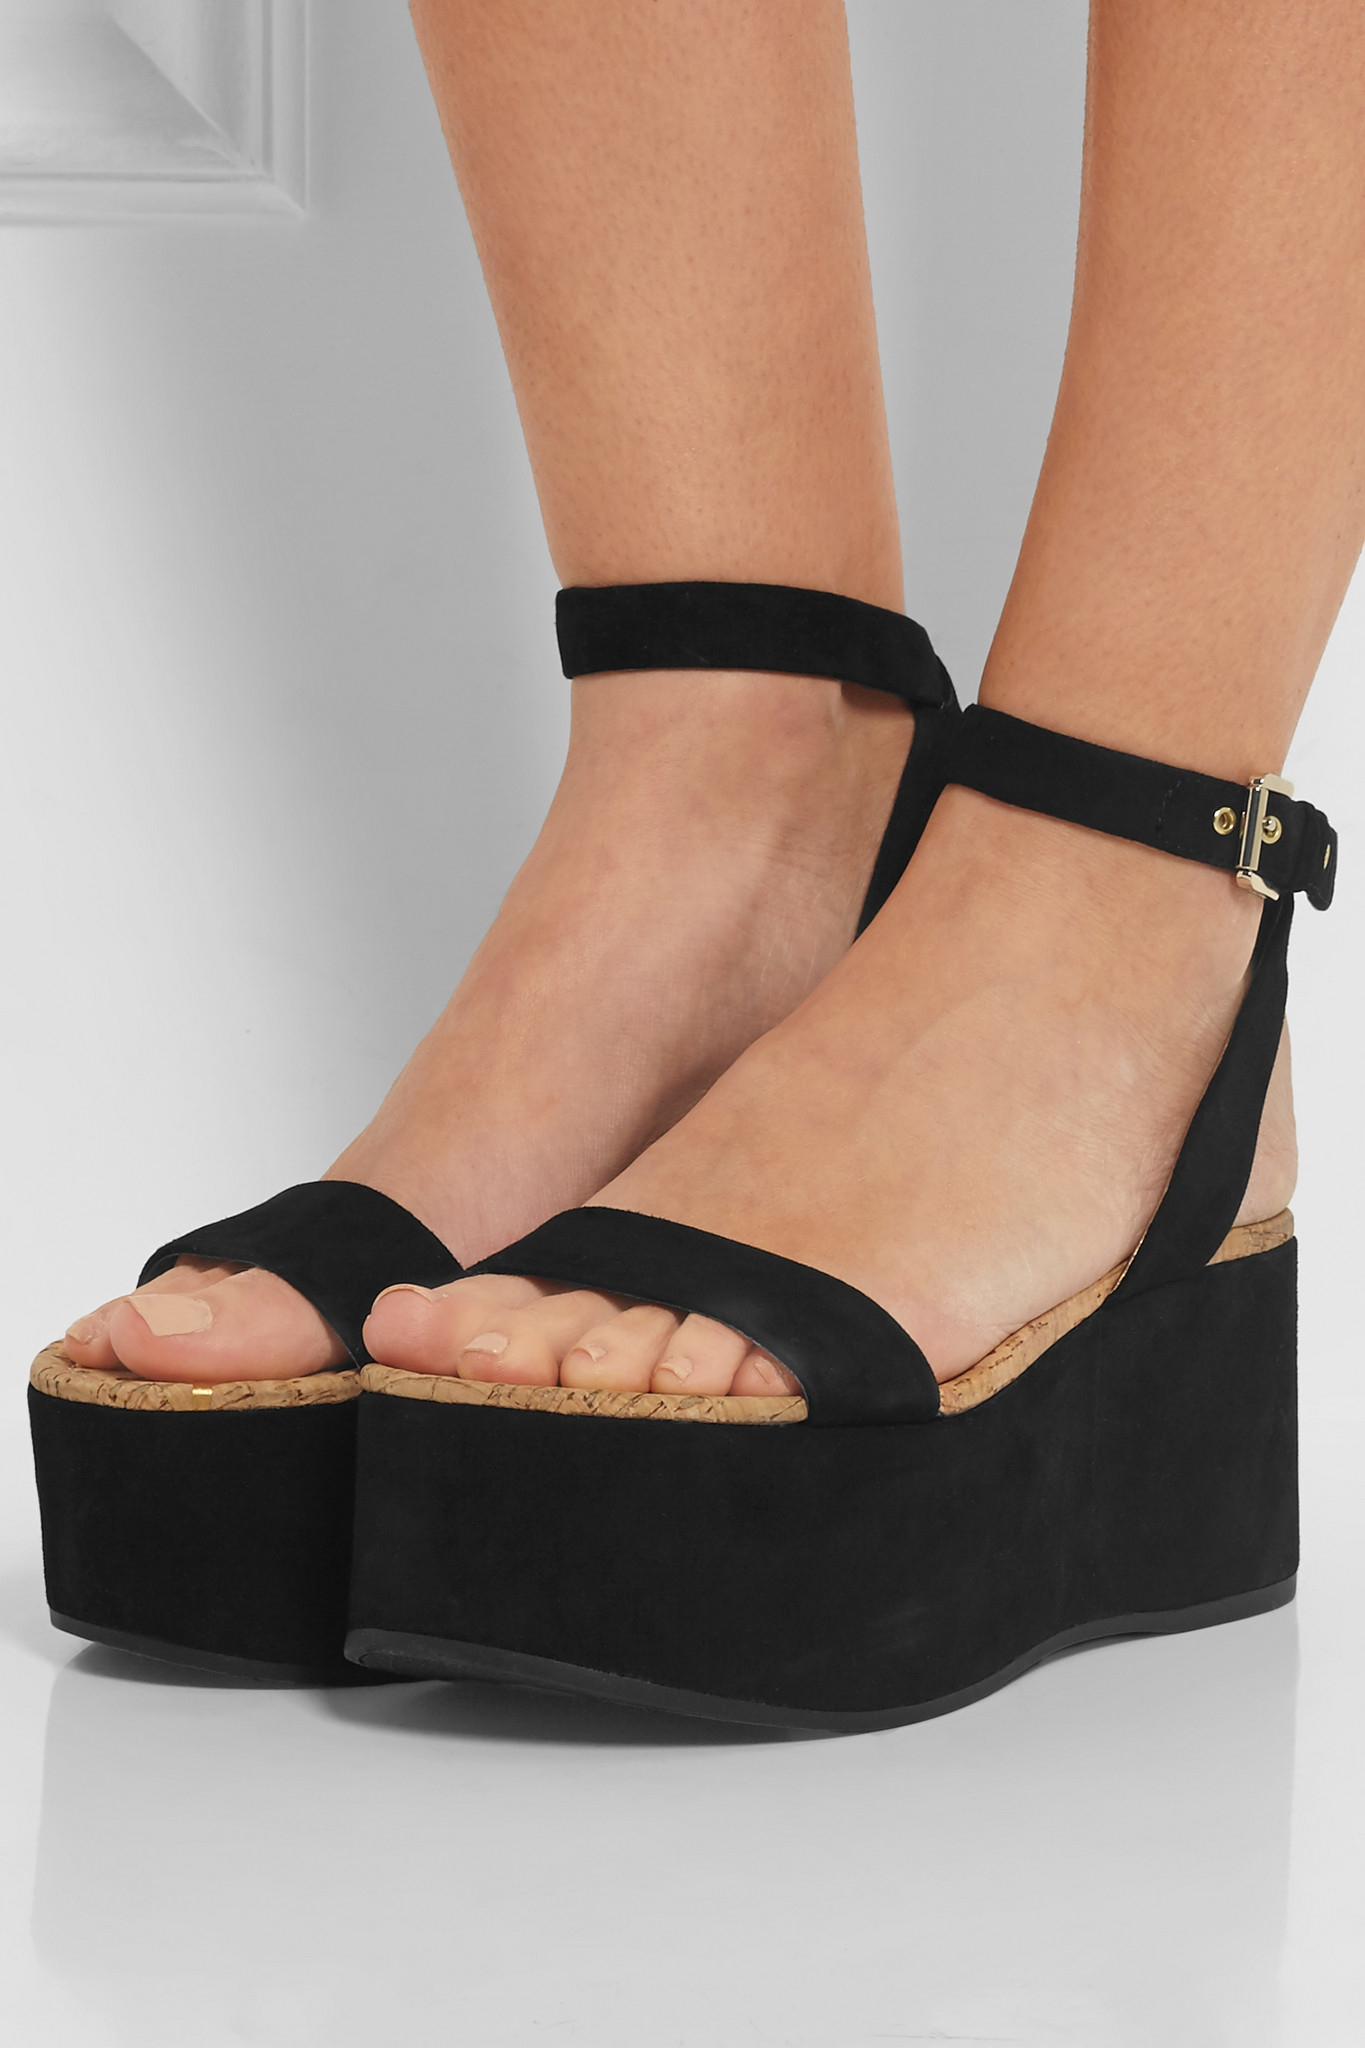 f2f4a90cdbc Lyst - Sam Edelman - Henley Suede Platform Sandals - Black in Black